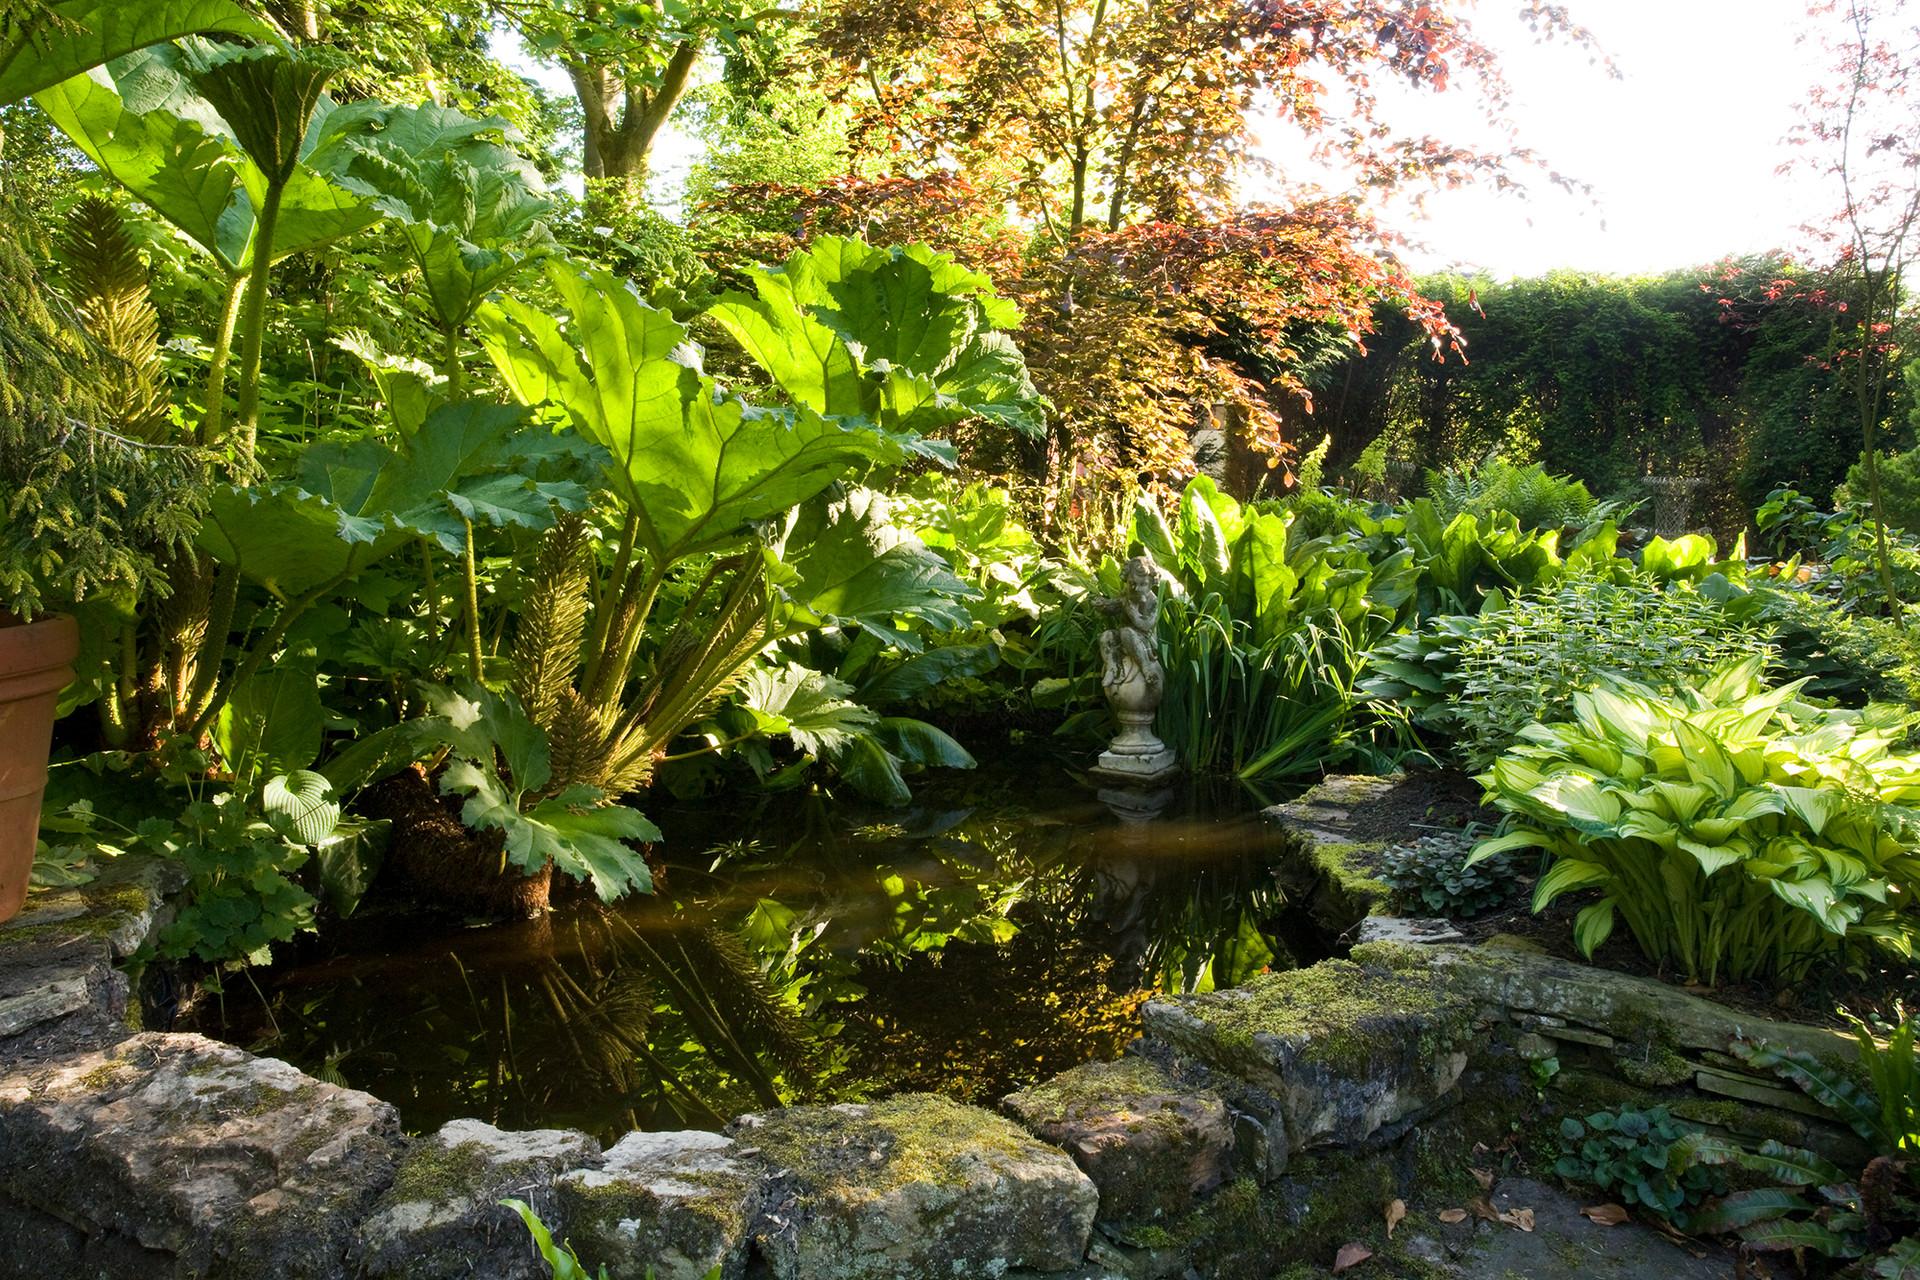 Gunnera and pond